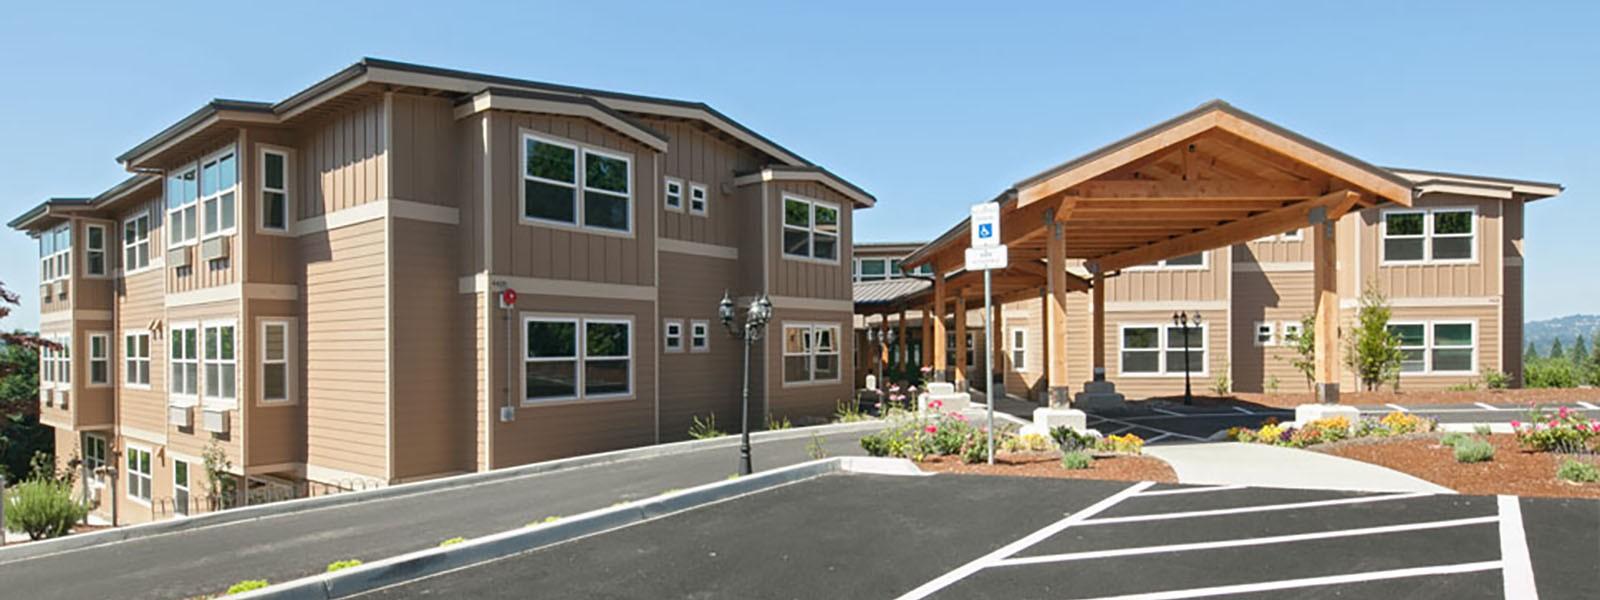 Elite Care at Oatfield Estates - Milwaukie, OR